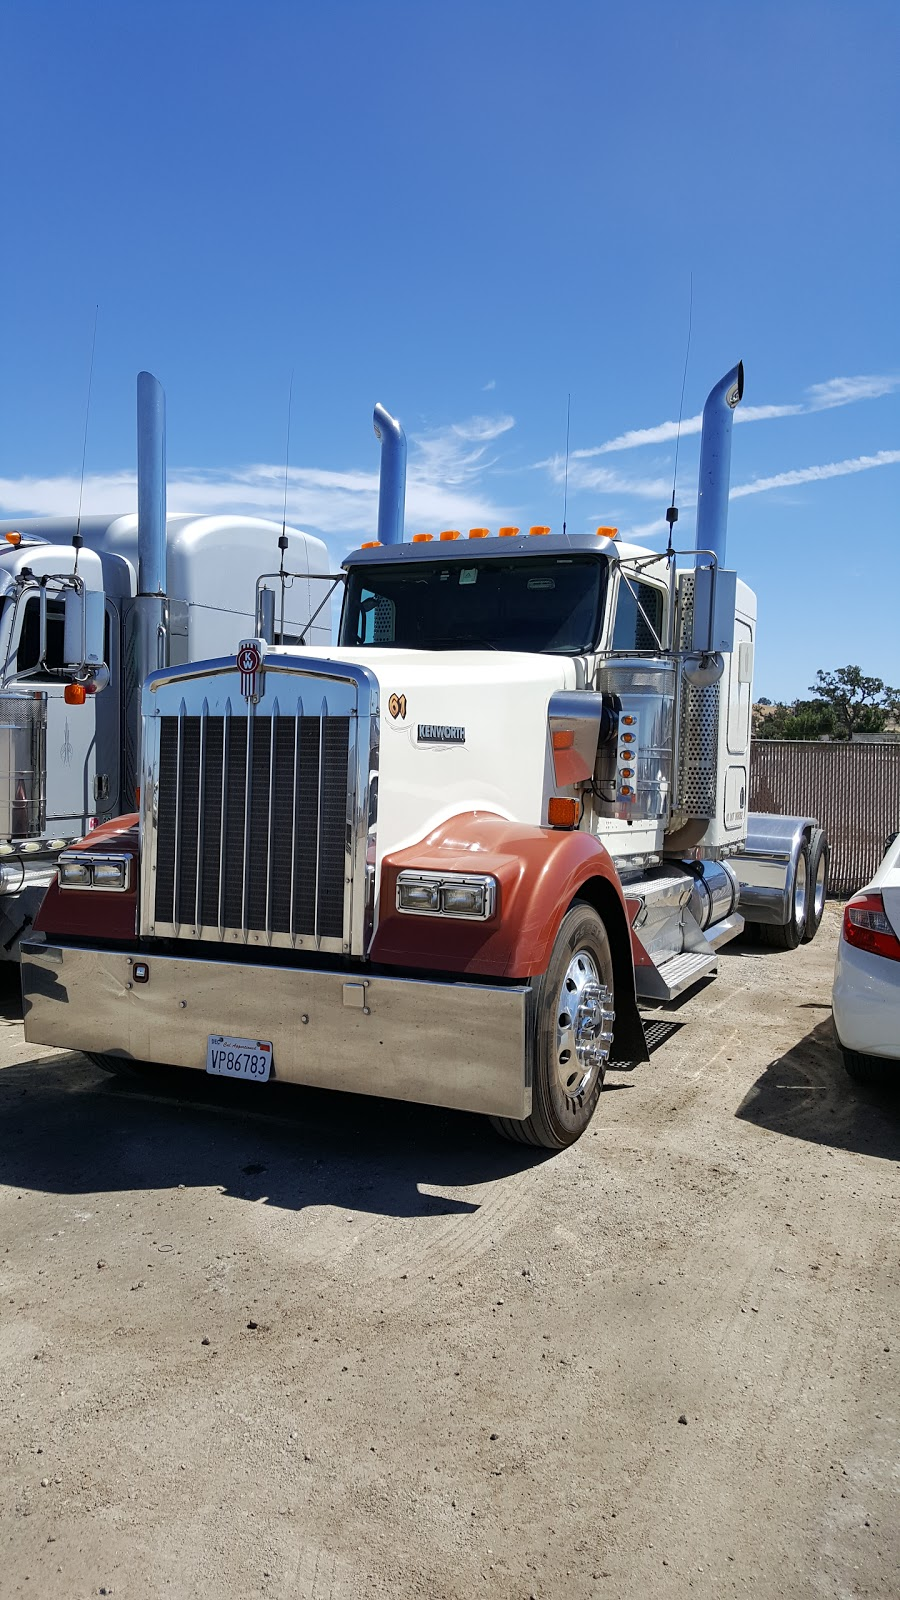 Michael Dusi Trucking Inc - moving company    Photo 2 of 5   Address: 3290 Combine St, Paso Robles, CA 93446, USA   Phone: (805) 239-4989